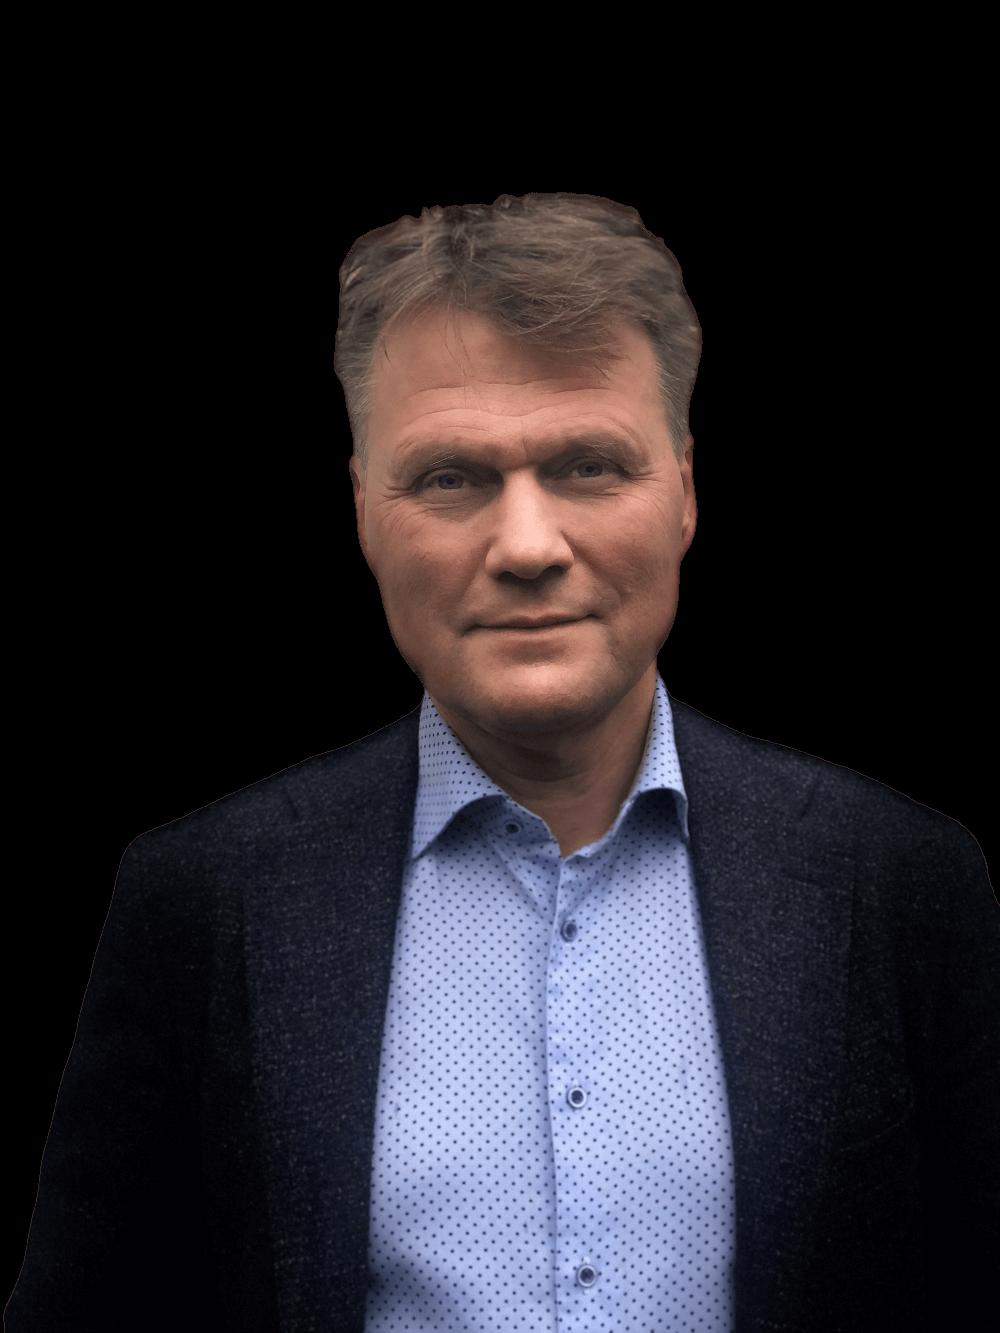 Jonas Christofersson